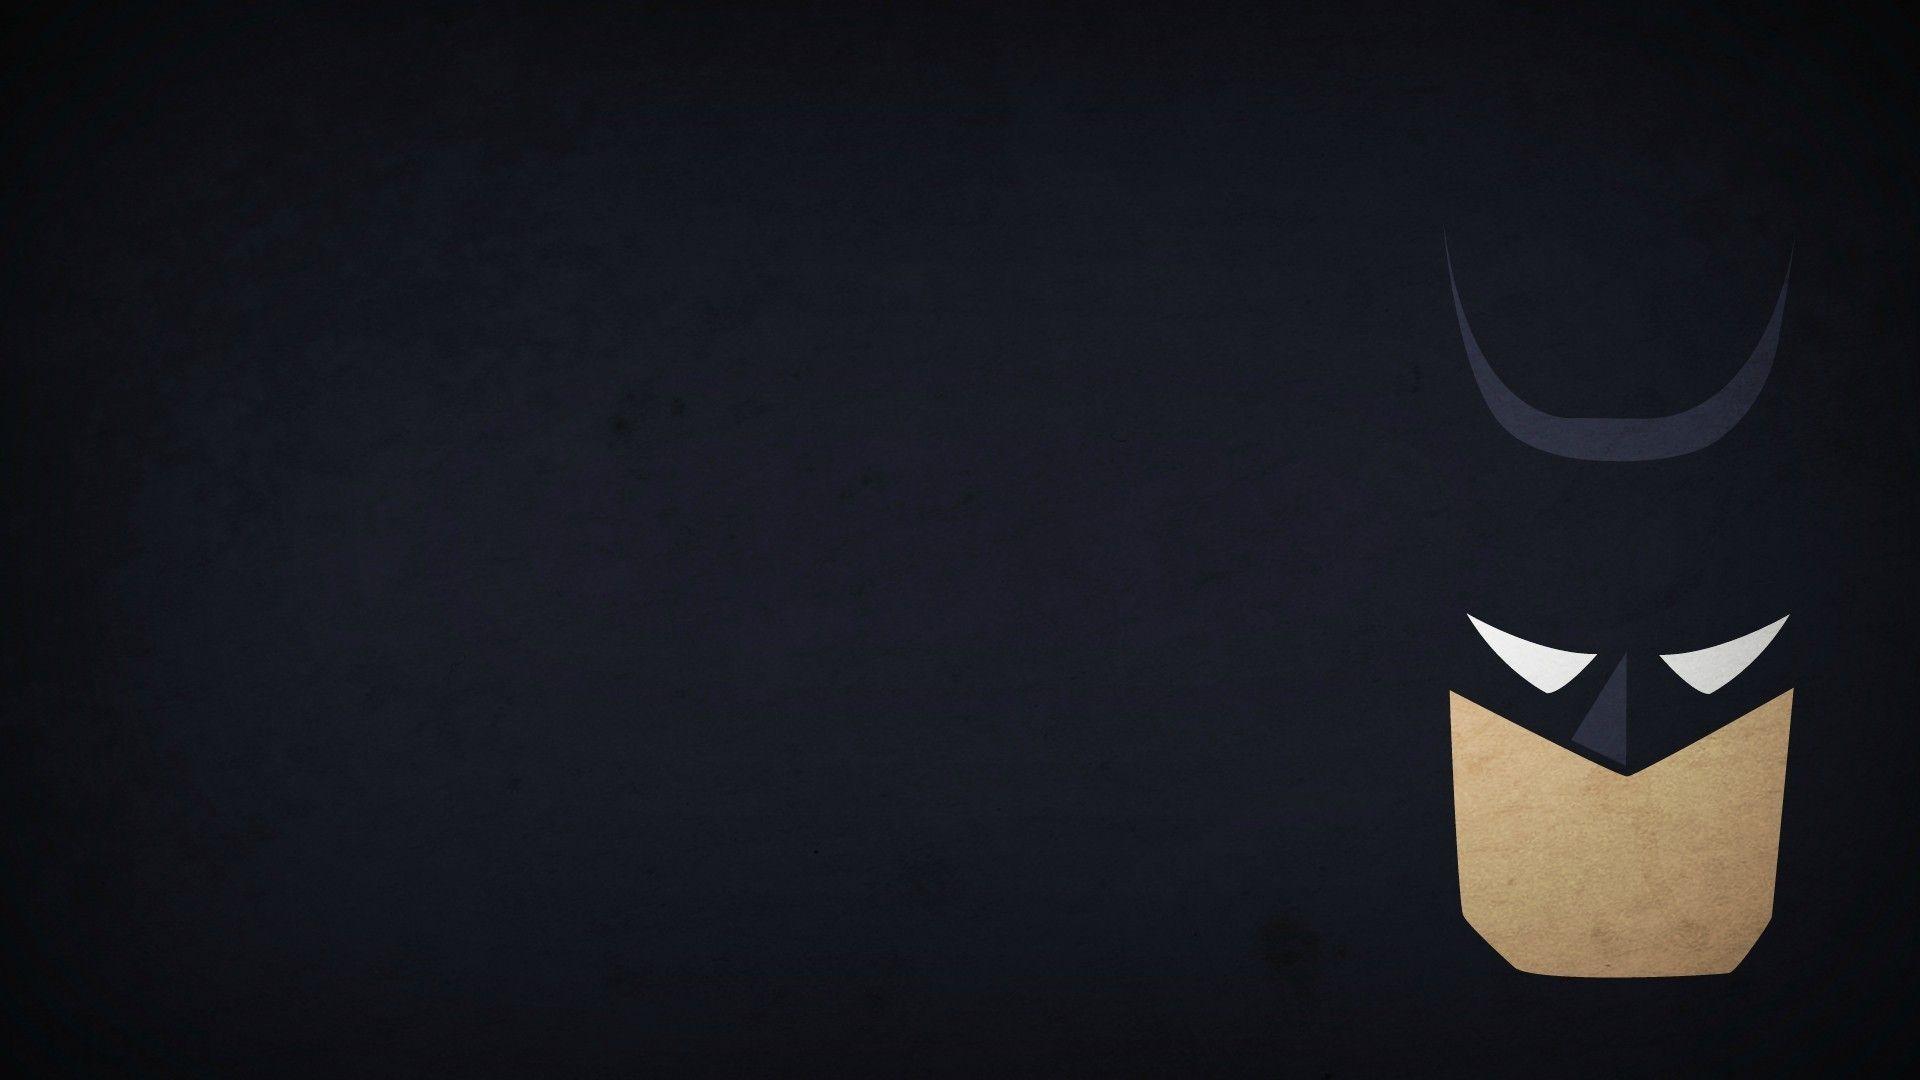 Batman minimalistic wallpapers pinterest high quality batman voltagebd Gallery